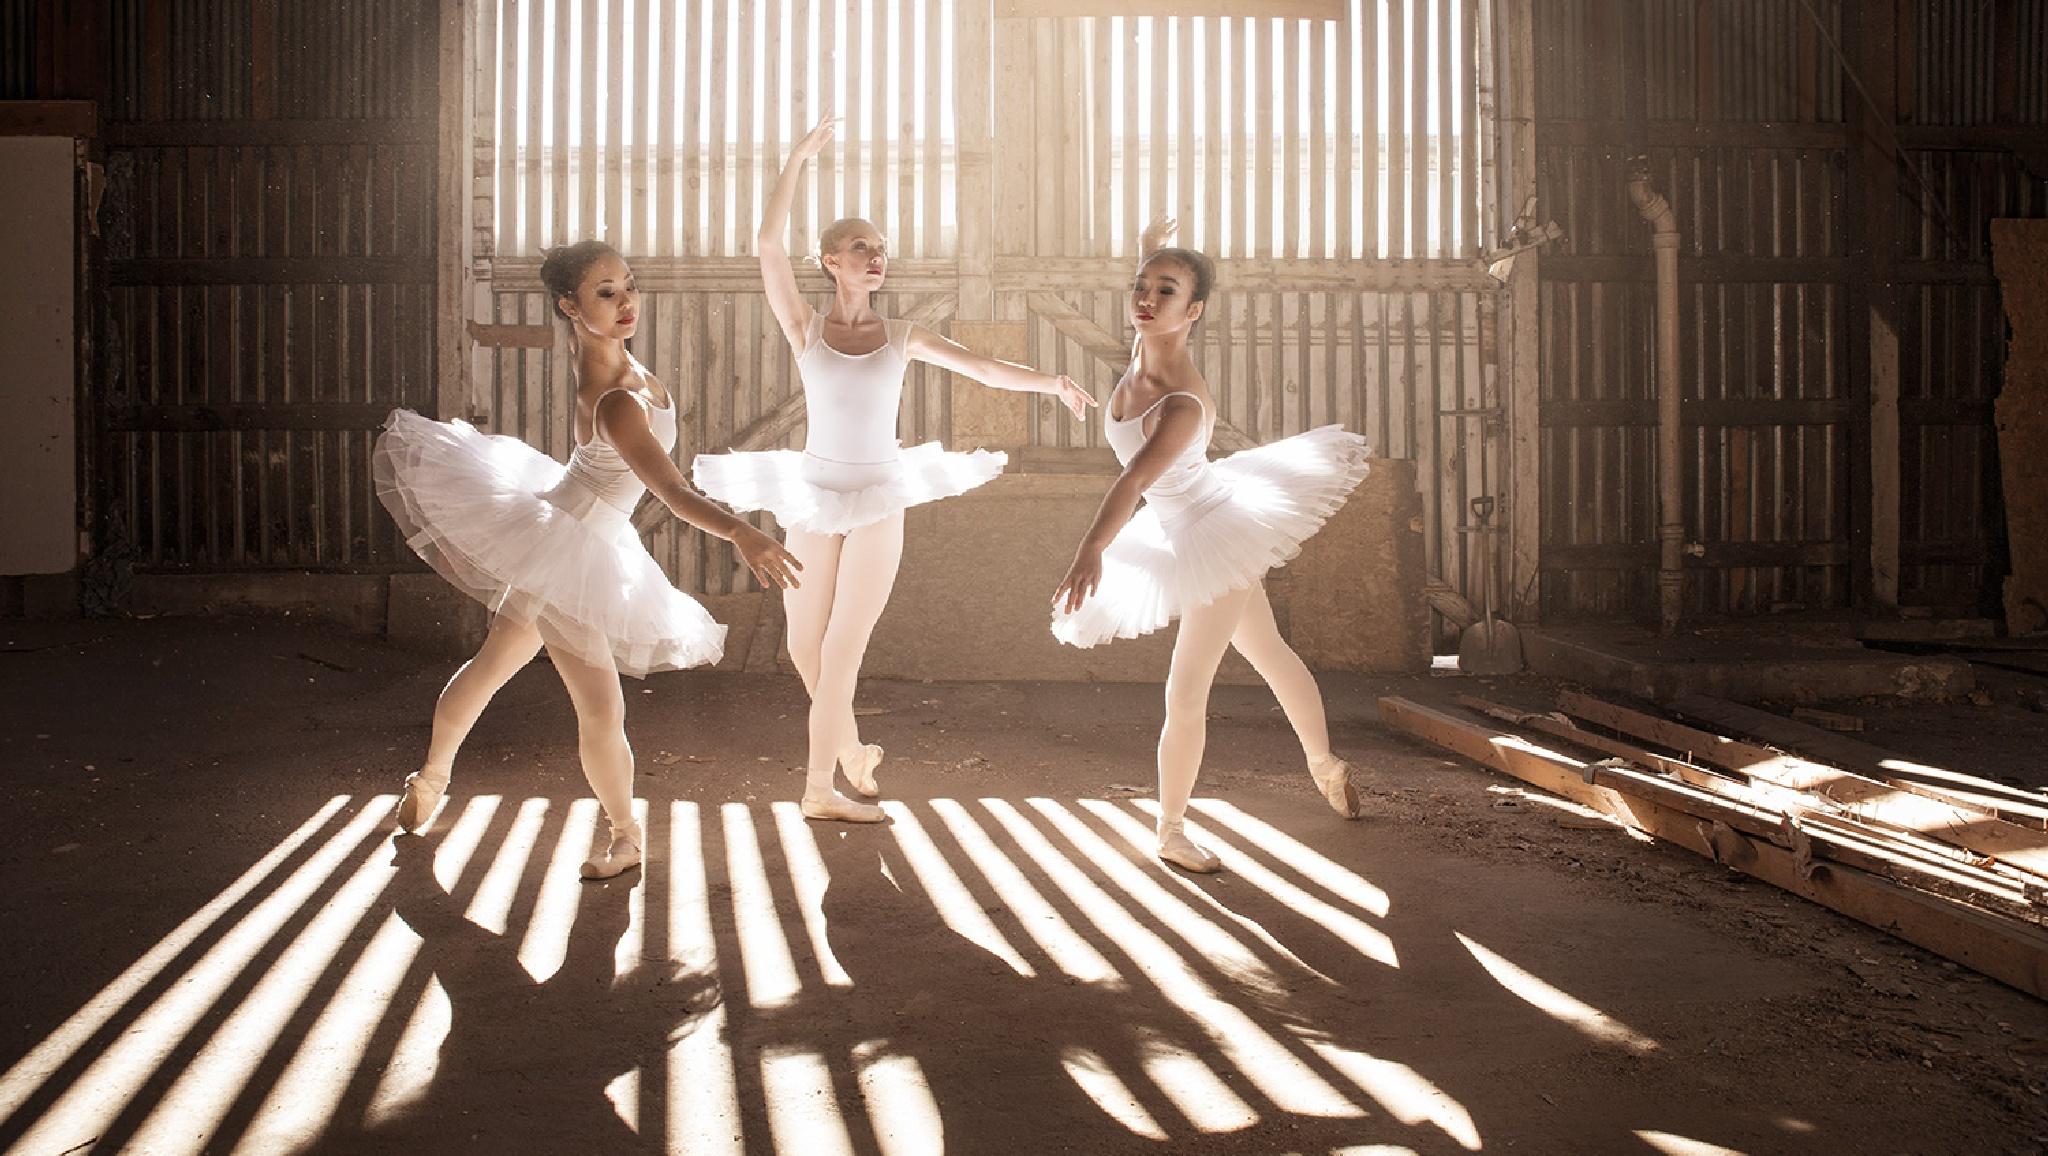 Light Ballet by AaronAndersonPhoto